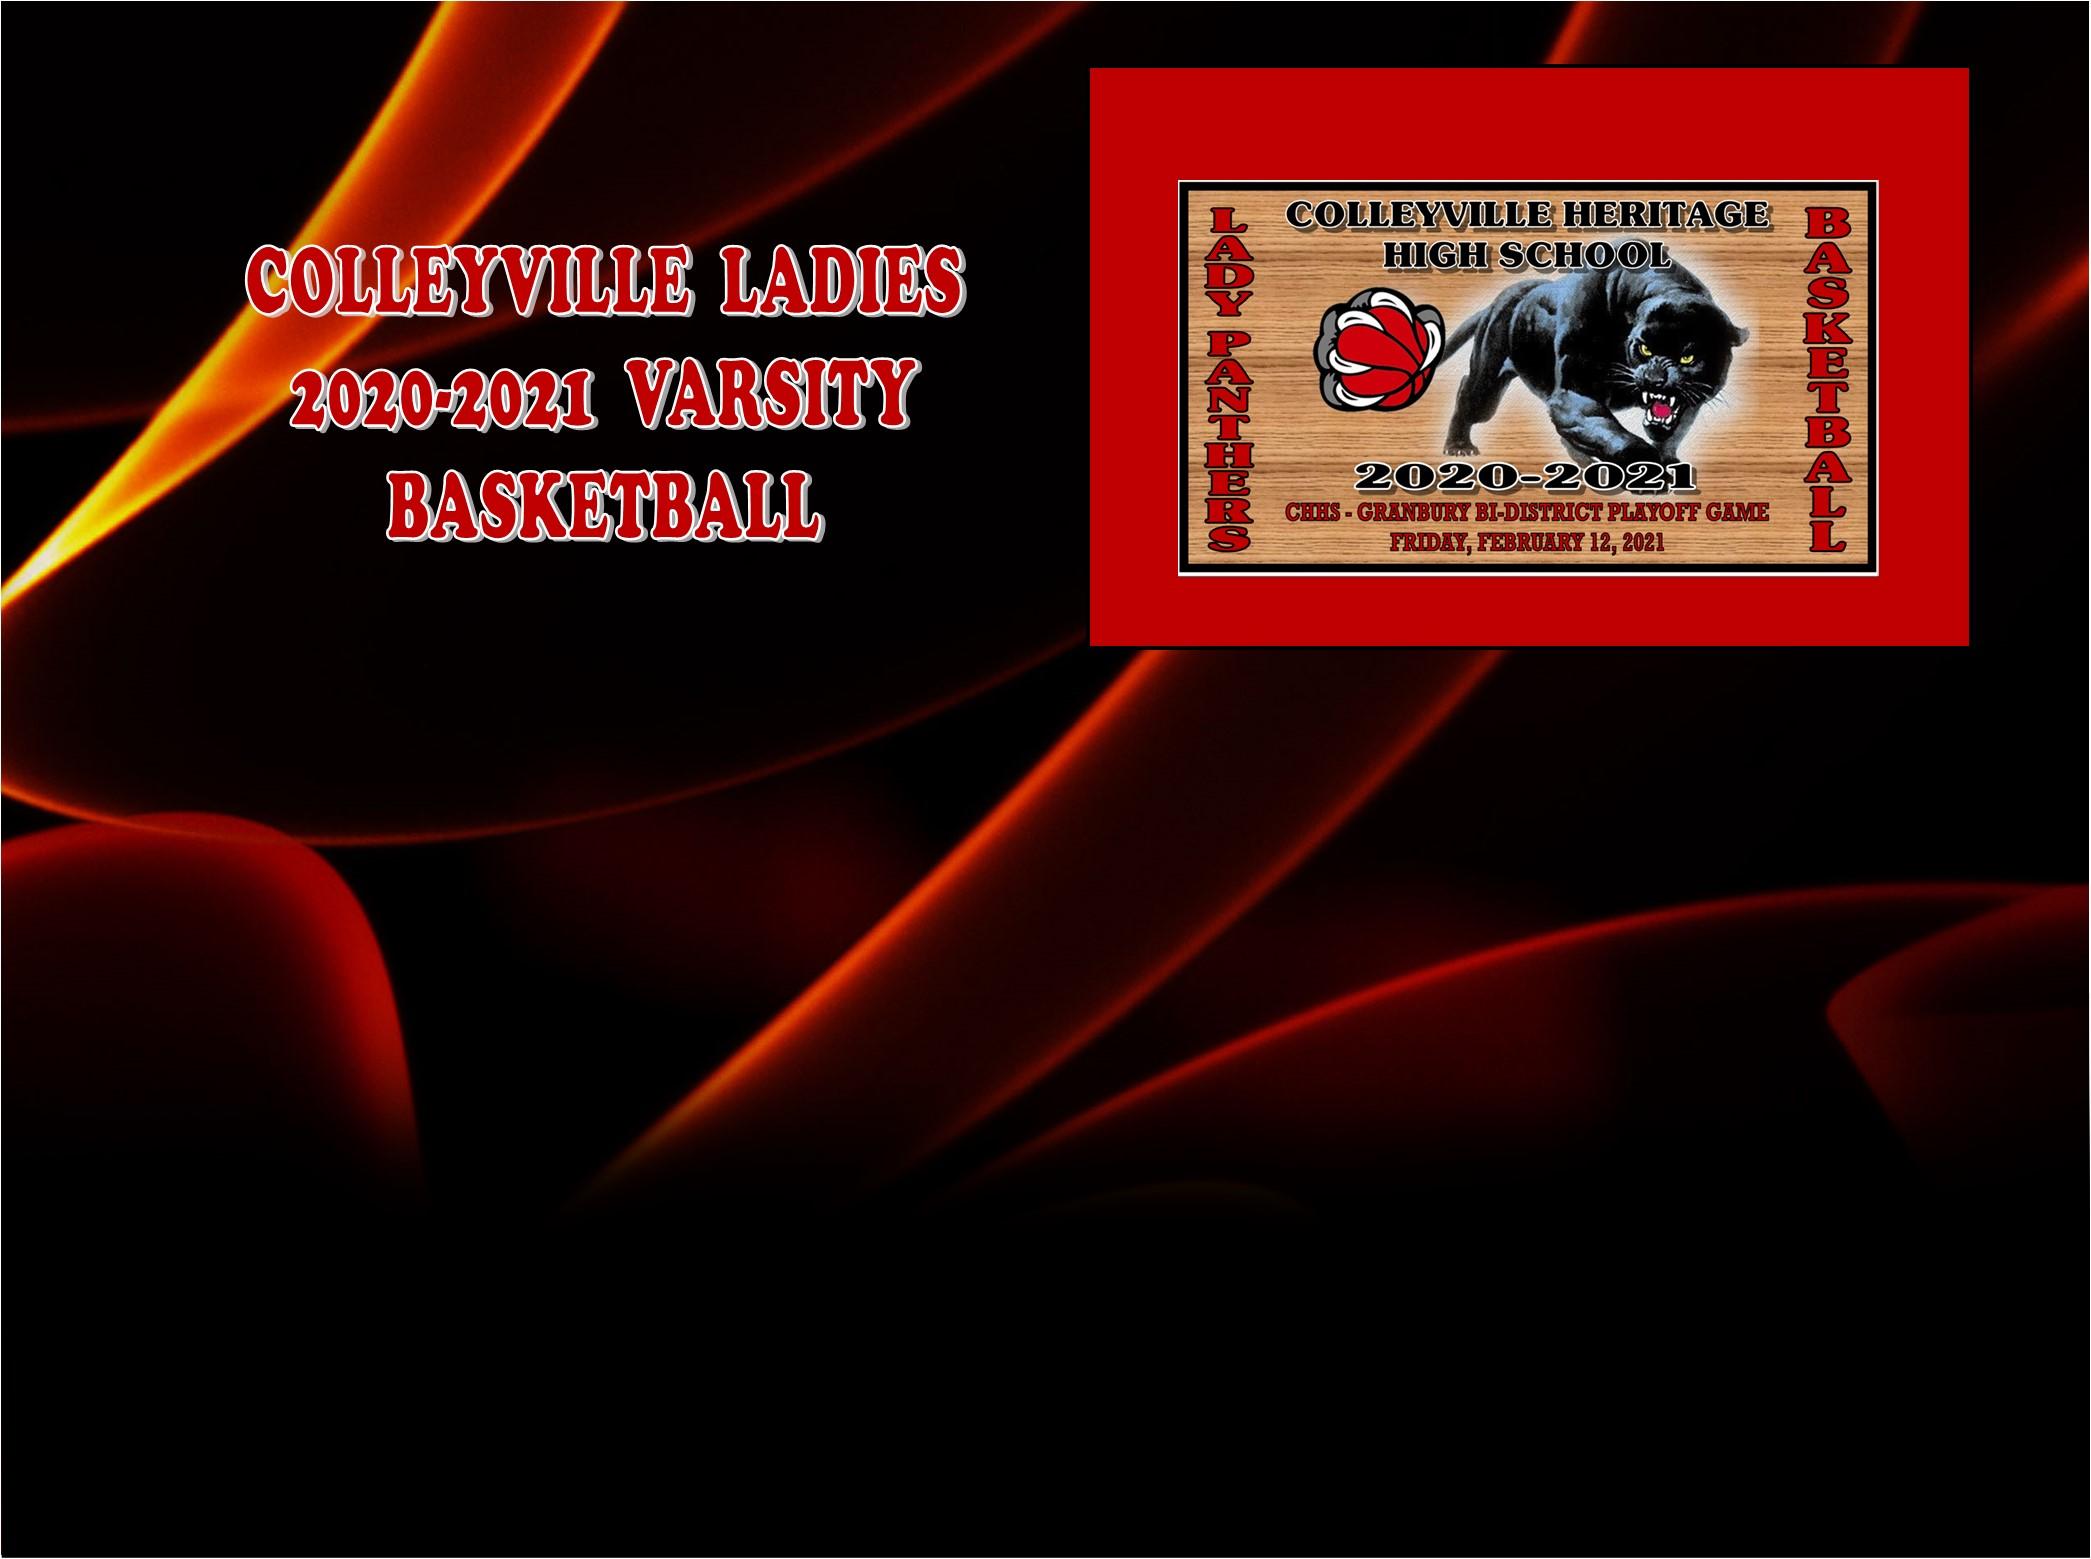 GCISD Ladies Basketball: Colleyville Panthers Lose Bi–District Playoff Game To The Granbury Pirates 38-54